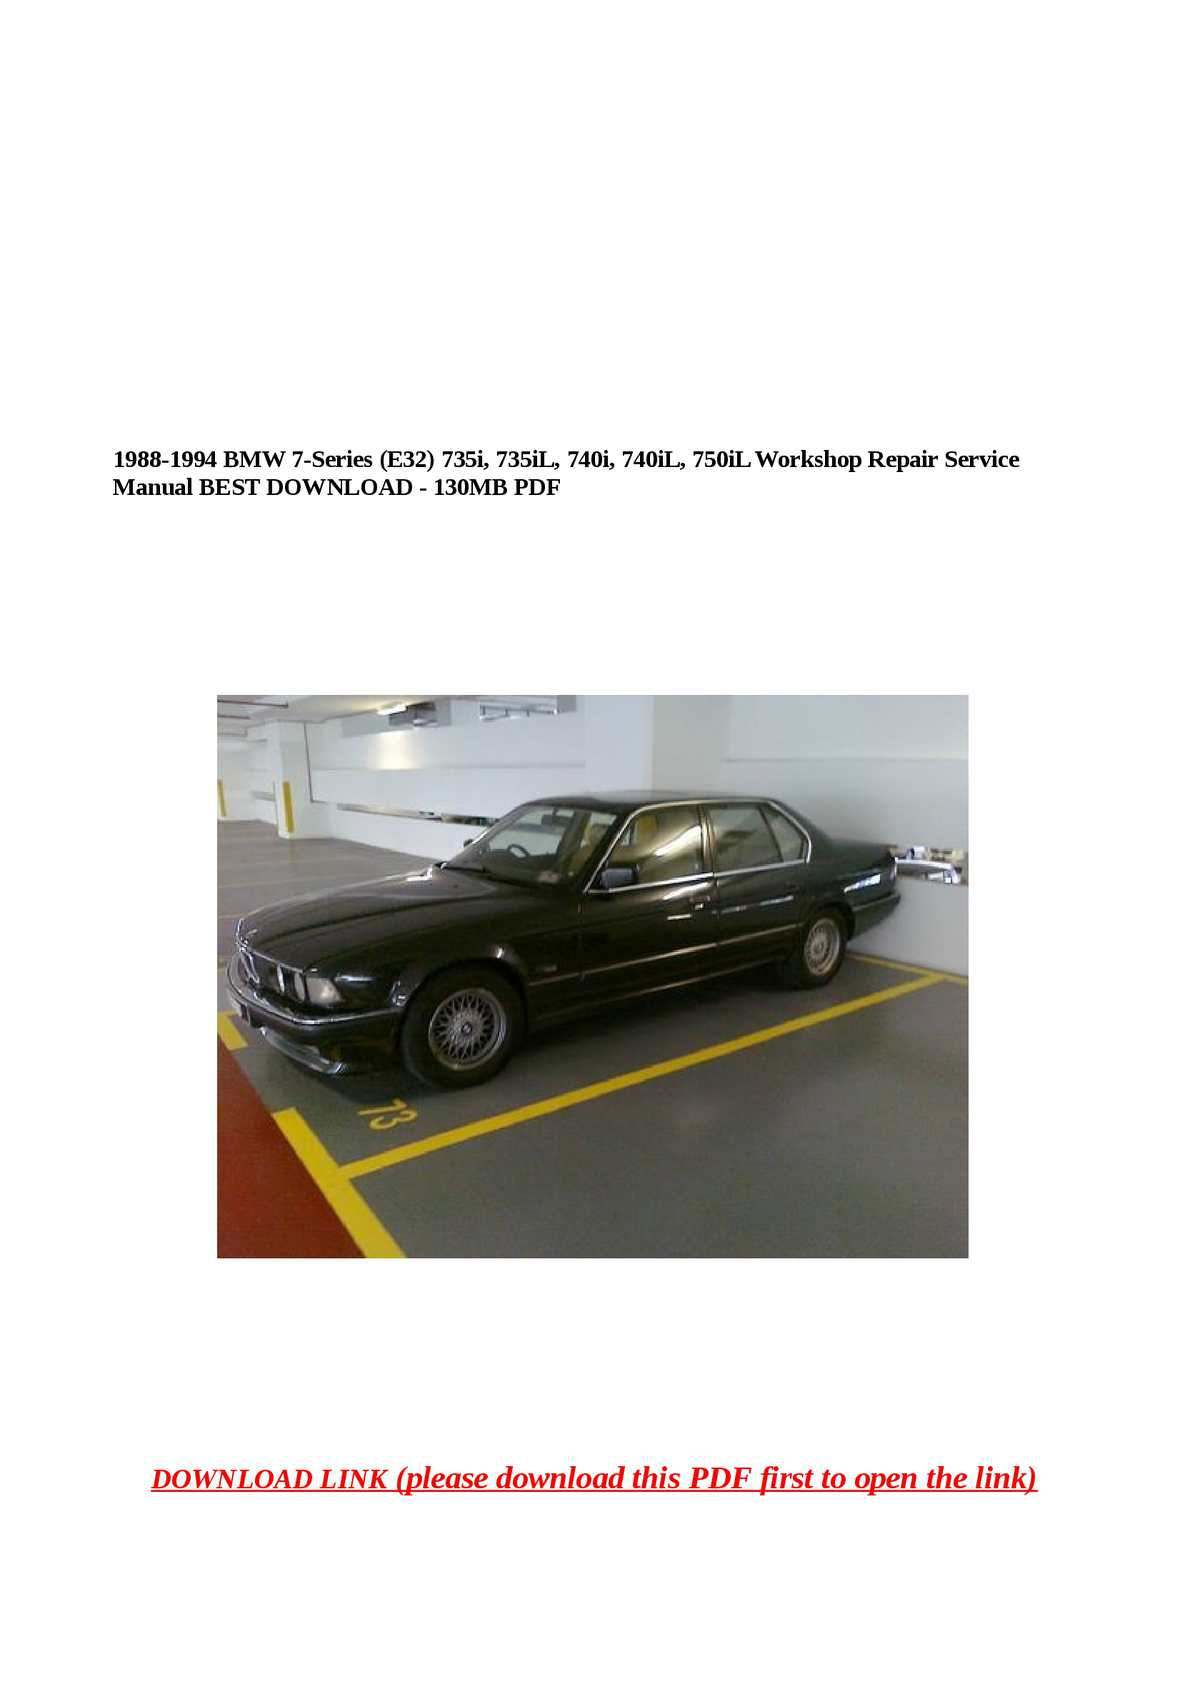 1990 Bmw 735i Stereo Wiring Diagram ...